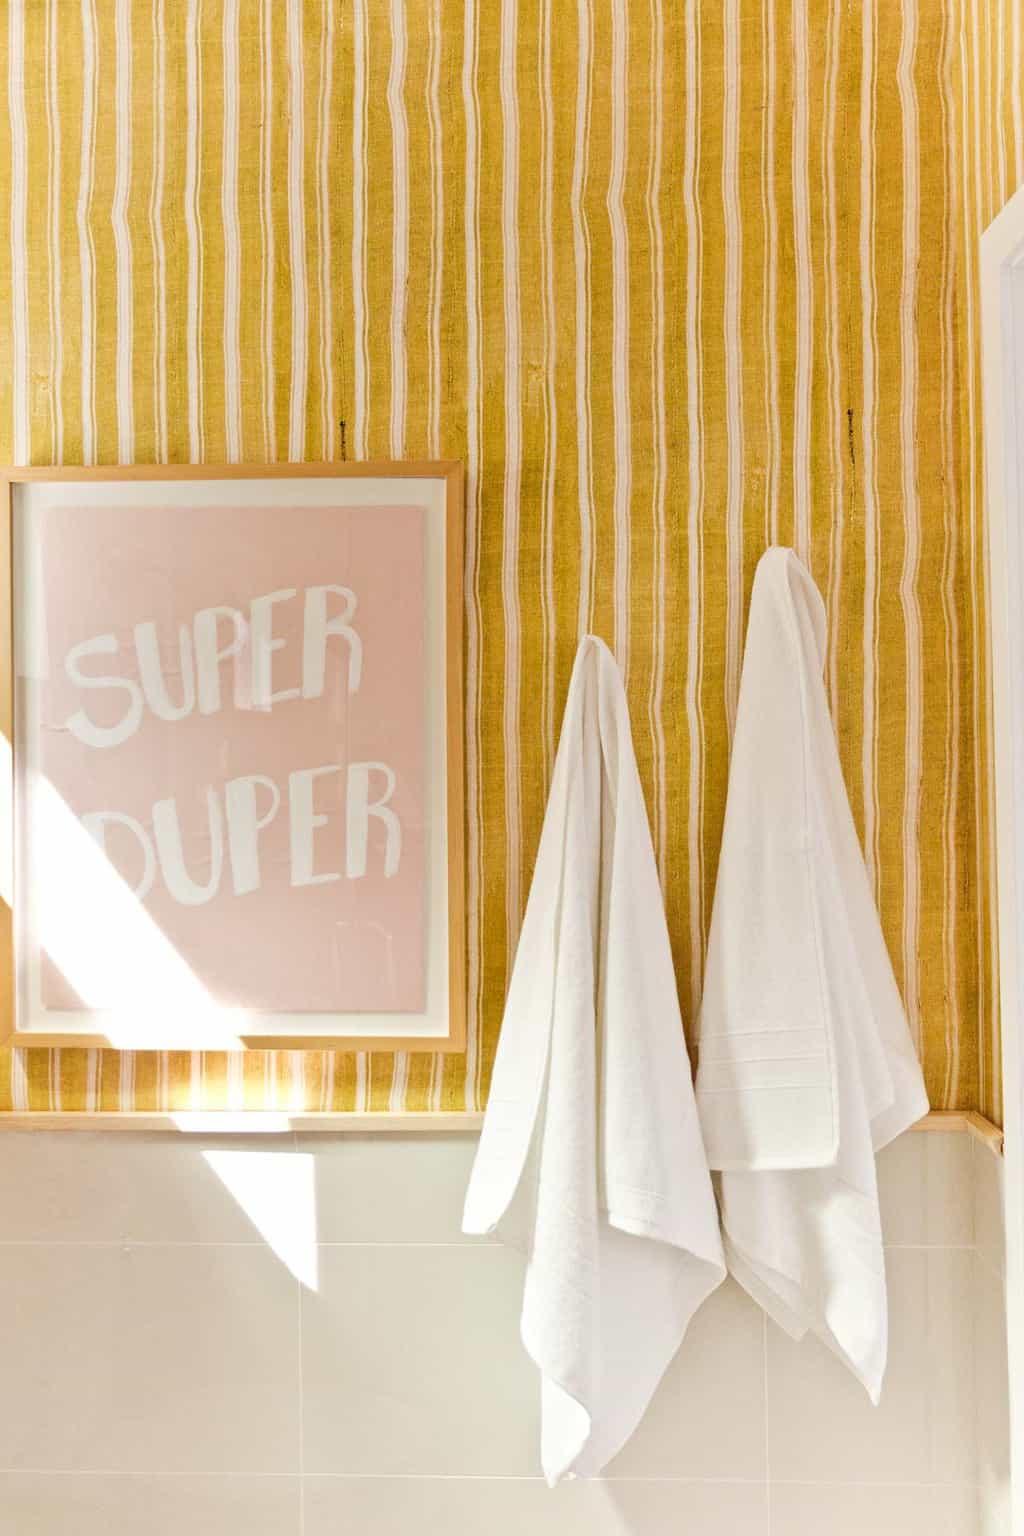 Super Duper graphic artwork in bold bathroom with stripes.